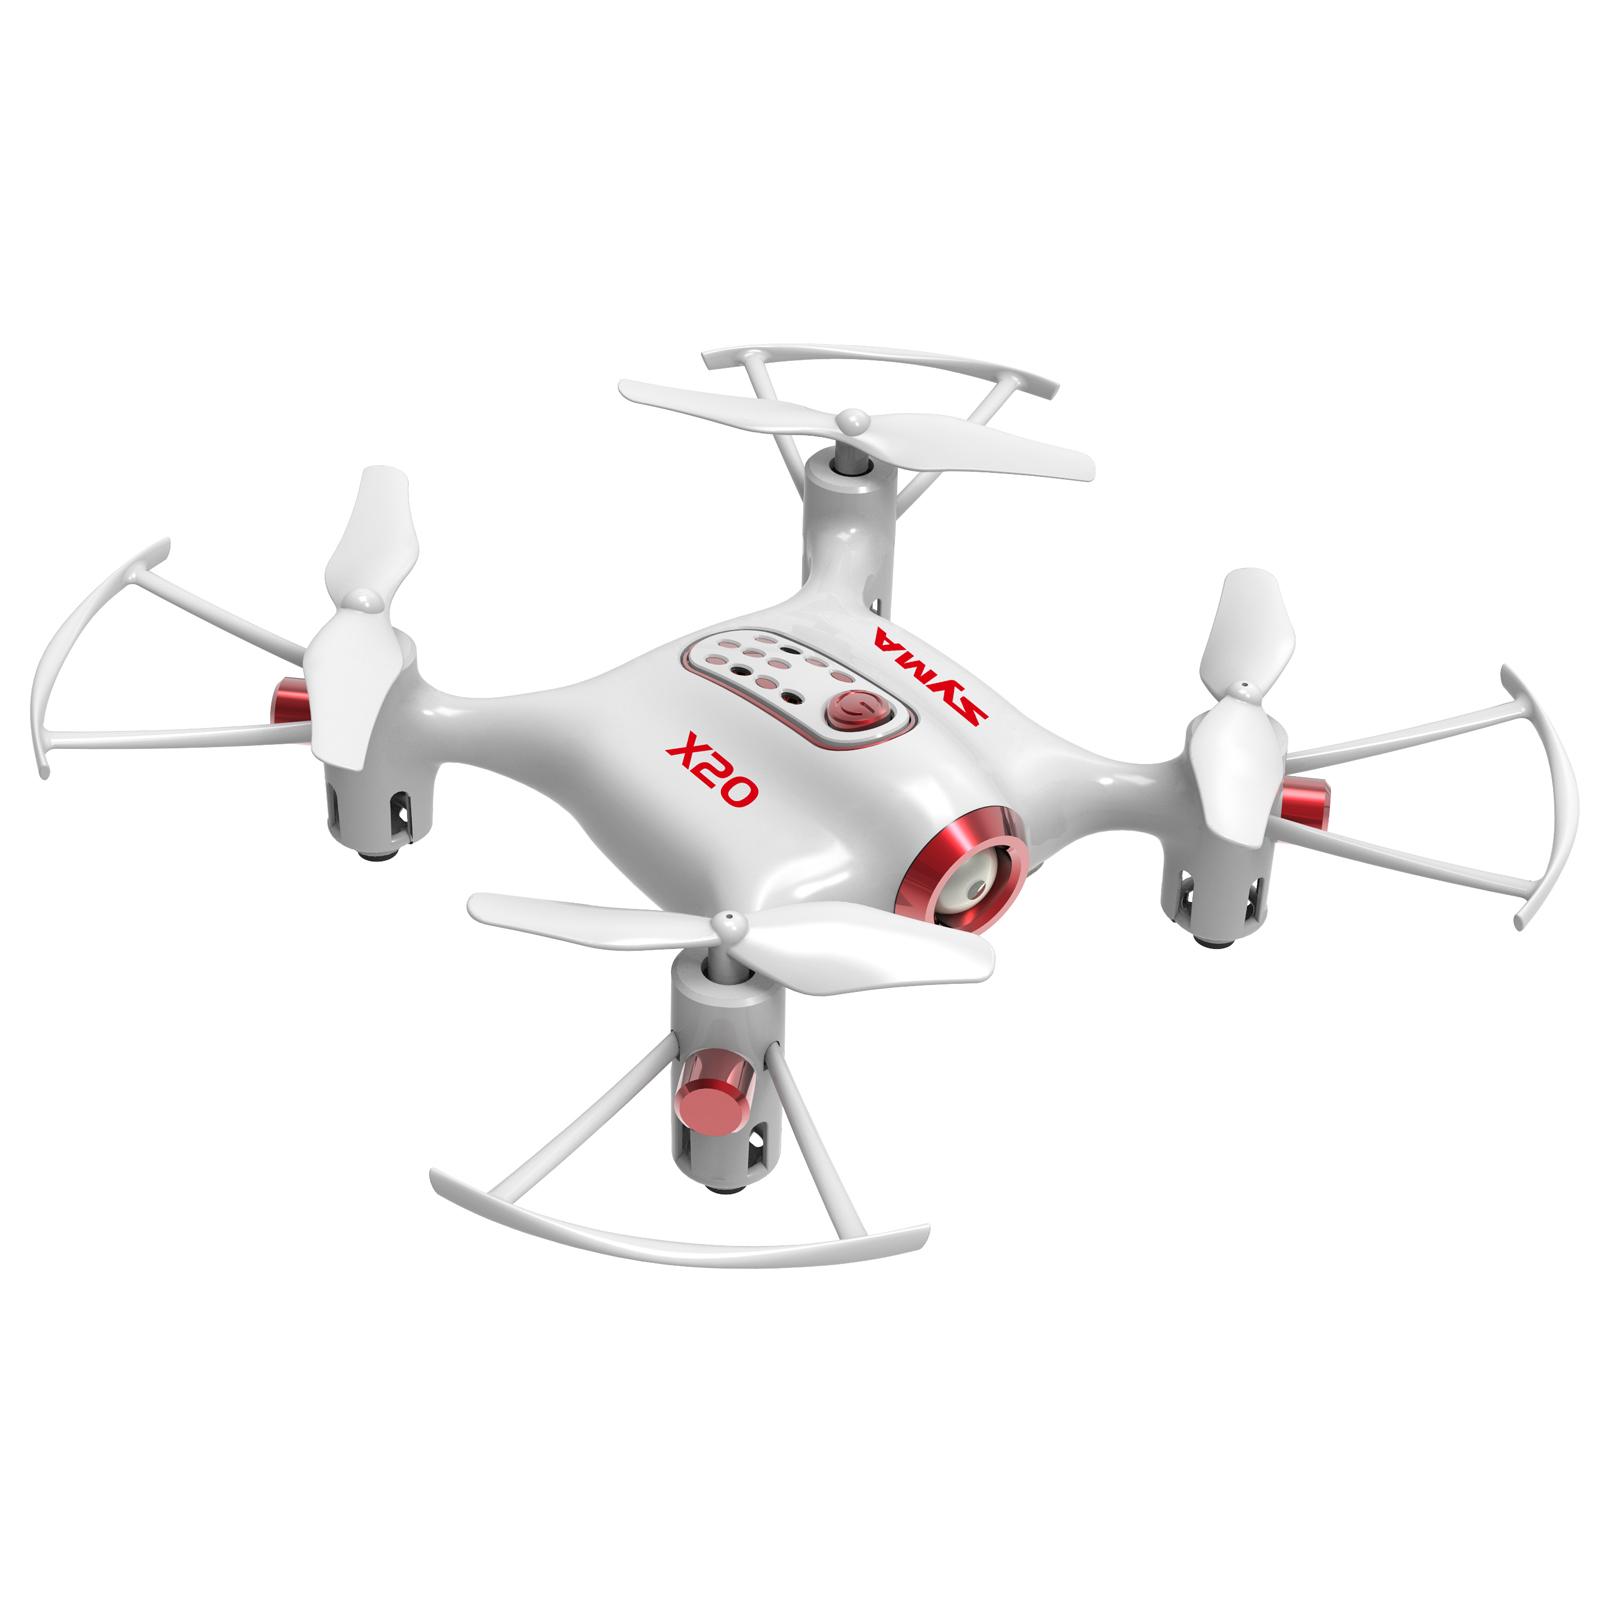 Syma X20 Pocket Drone 2 4ghz Mini Rc Quadcopter Headless